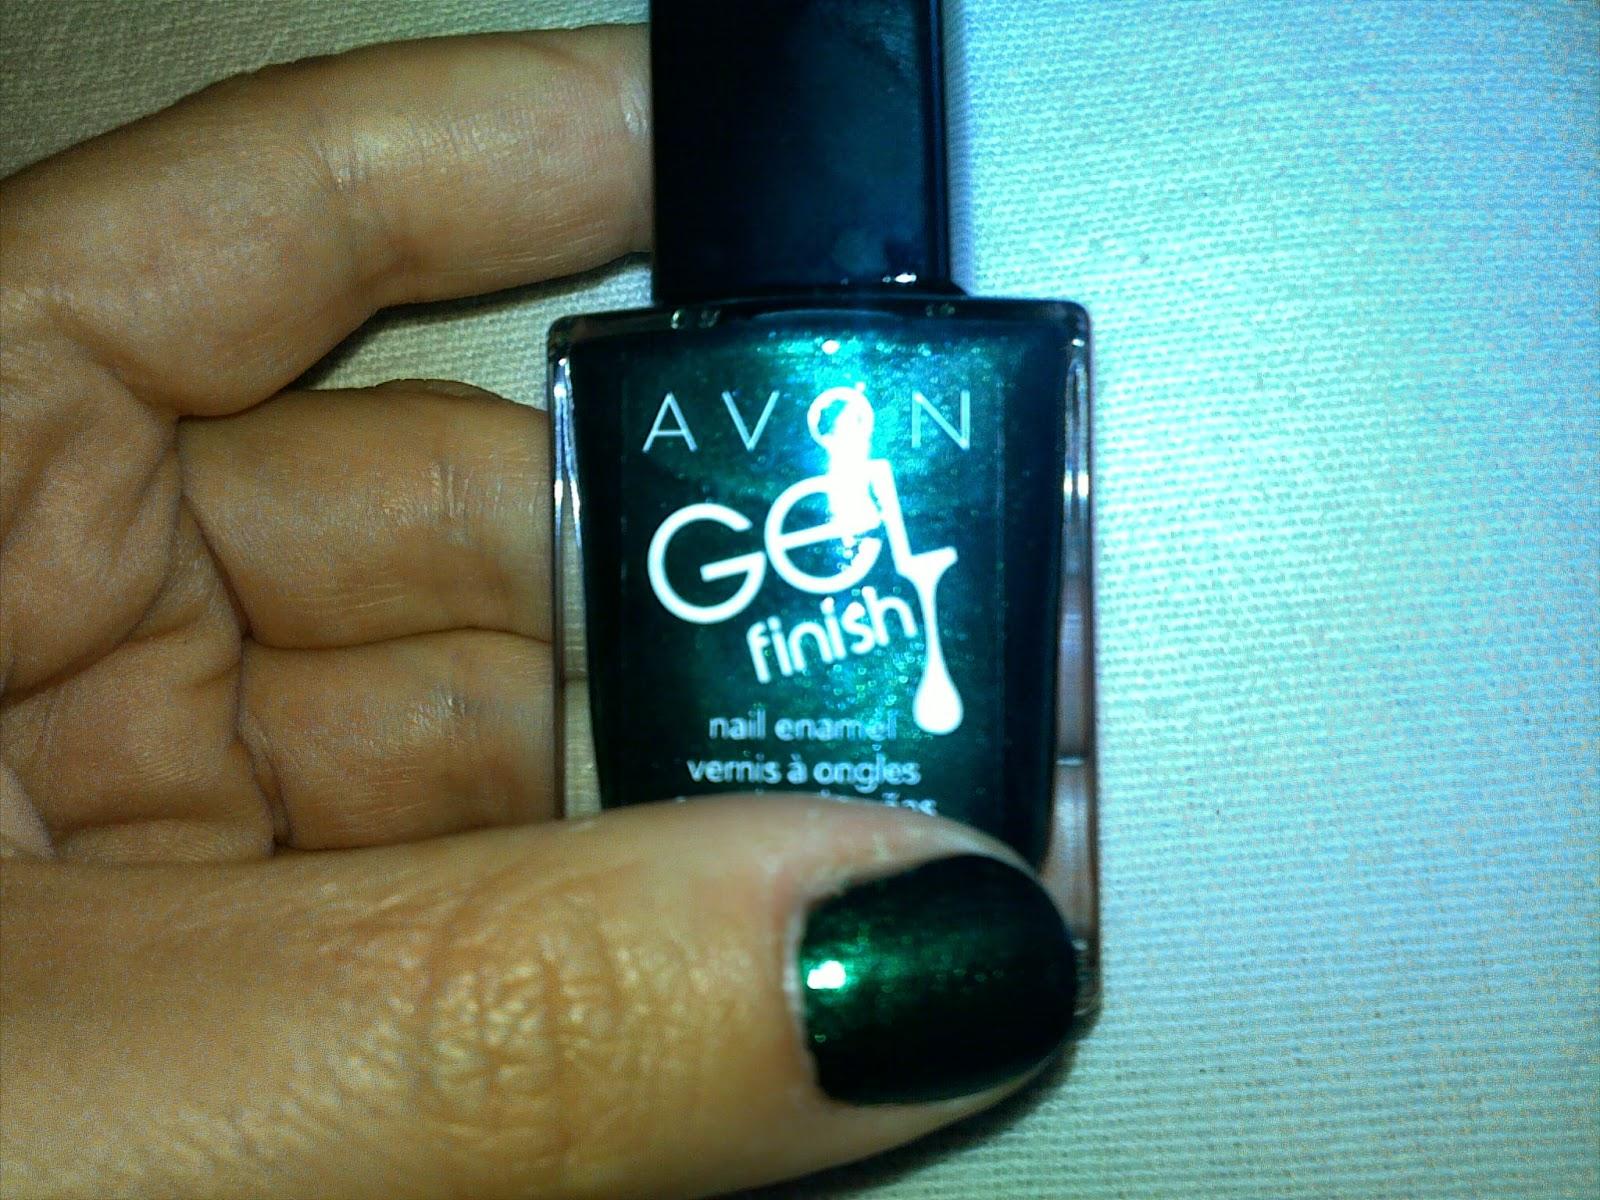 Avon, Gel Finish Nail Enamel, in shade Envy